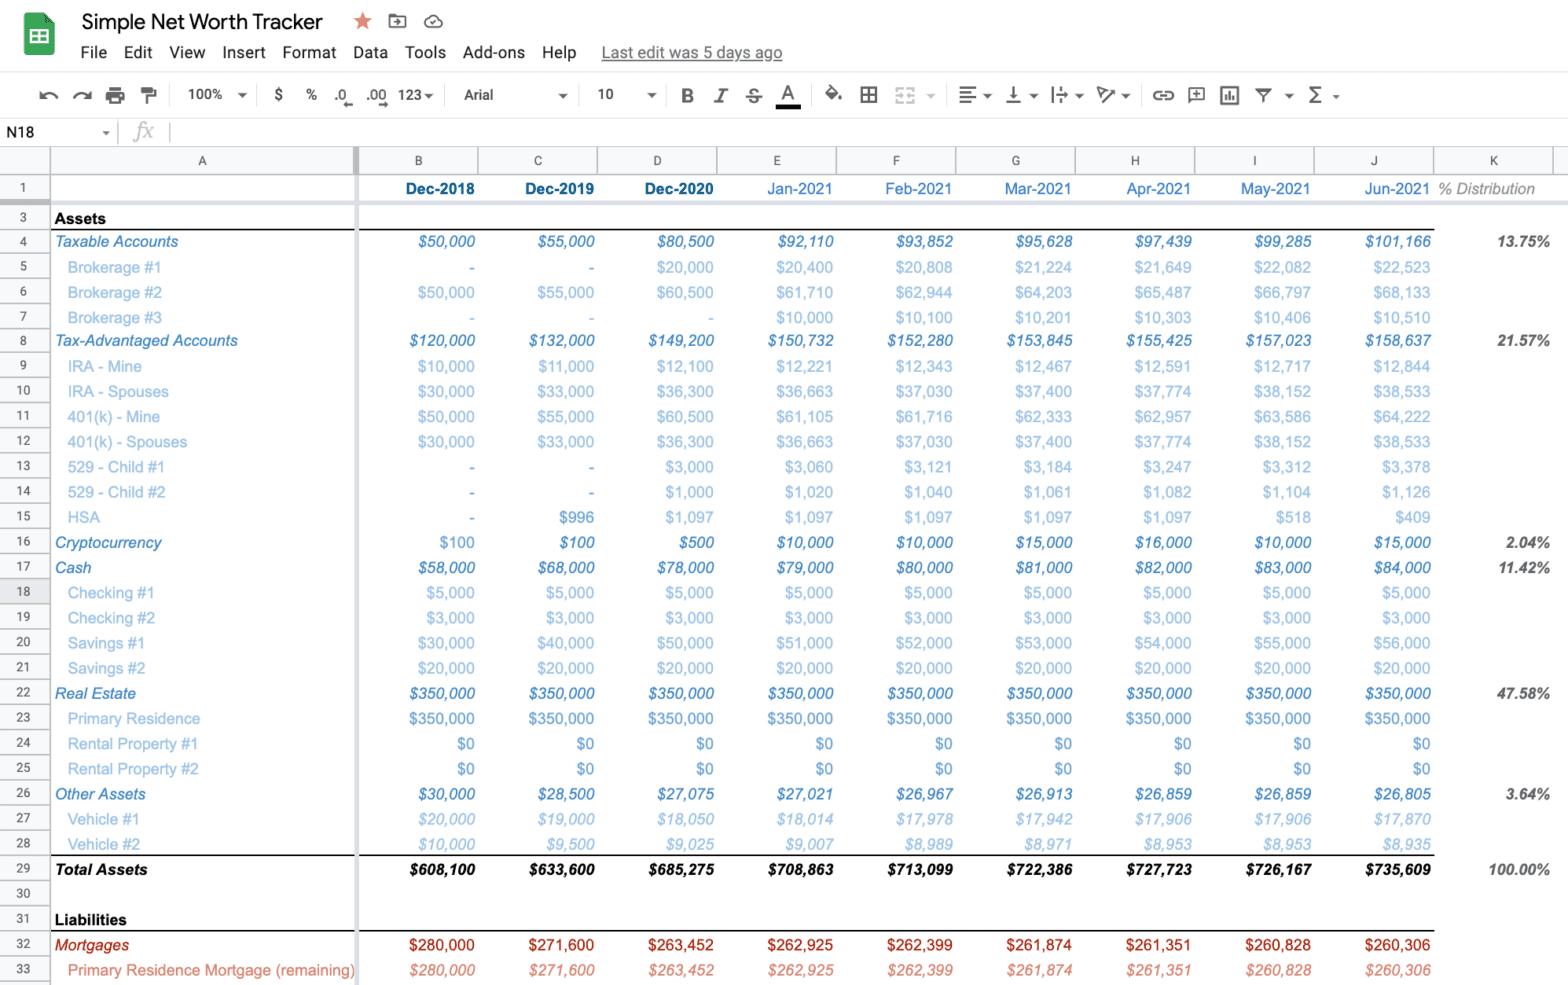 Simple Net Worth Tracker Spreadsheet